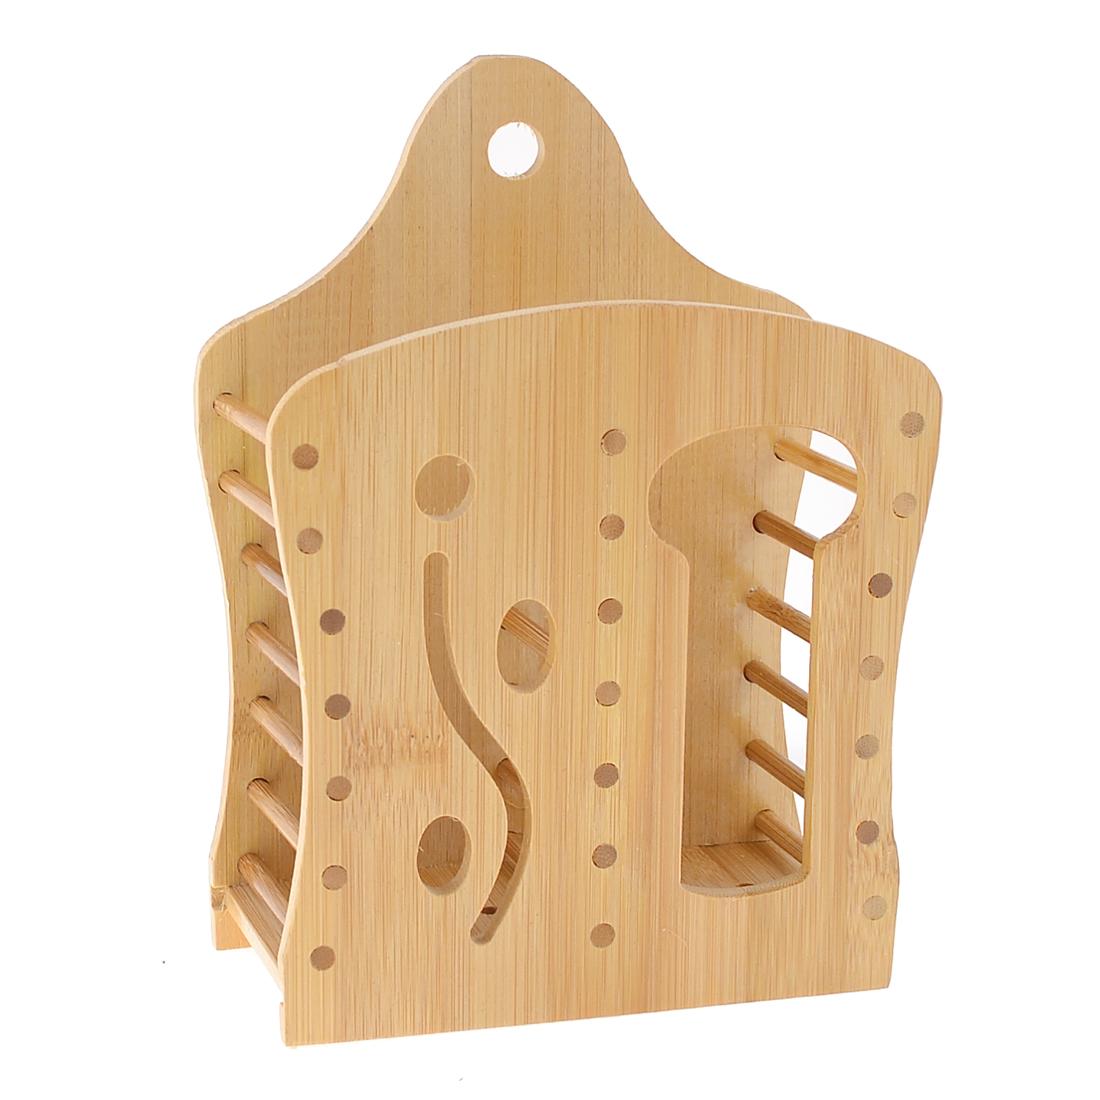 Home Kitchen Wood Color Wooden 2 Compartments Chopsticks Case Organizer